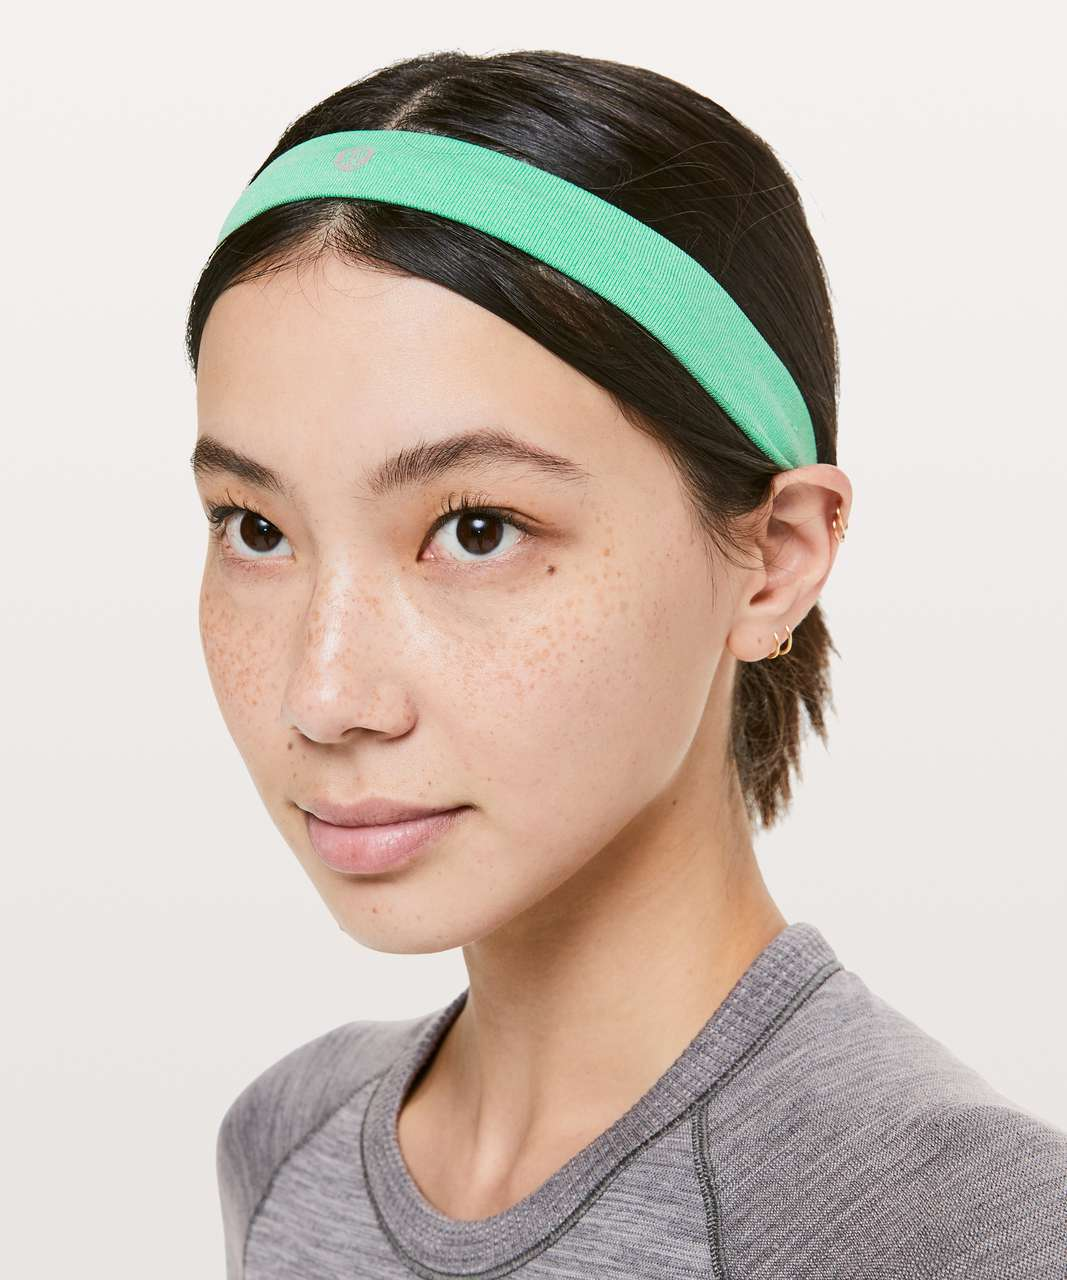 Lululemon Cardio Cross Trainer Headband - Tropix Green / White